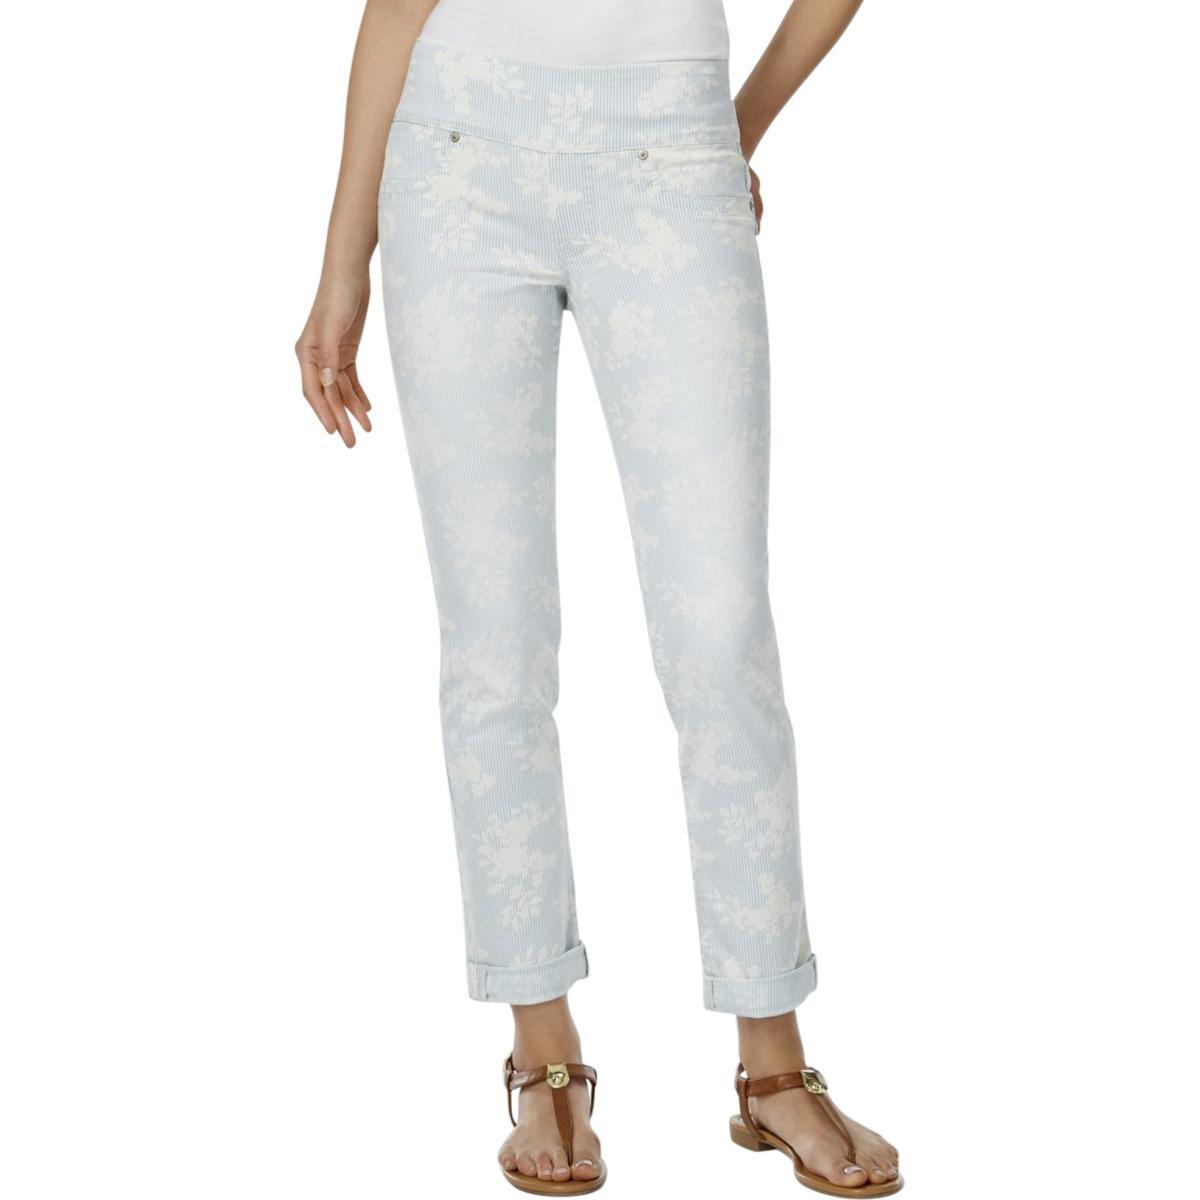 Style & Co. Womens Ella Floral Cuffed Boyfriend Jeans Blue L